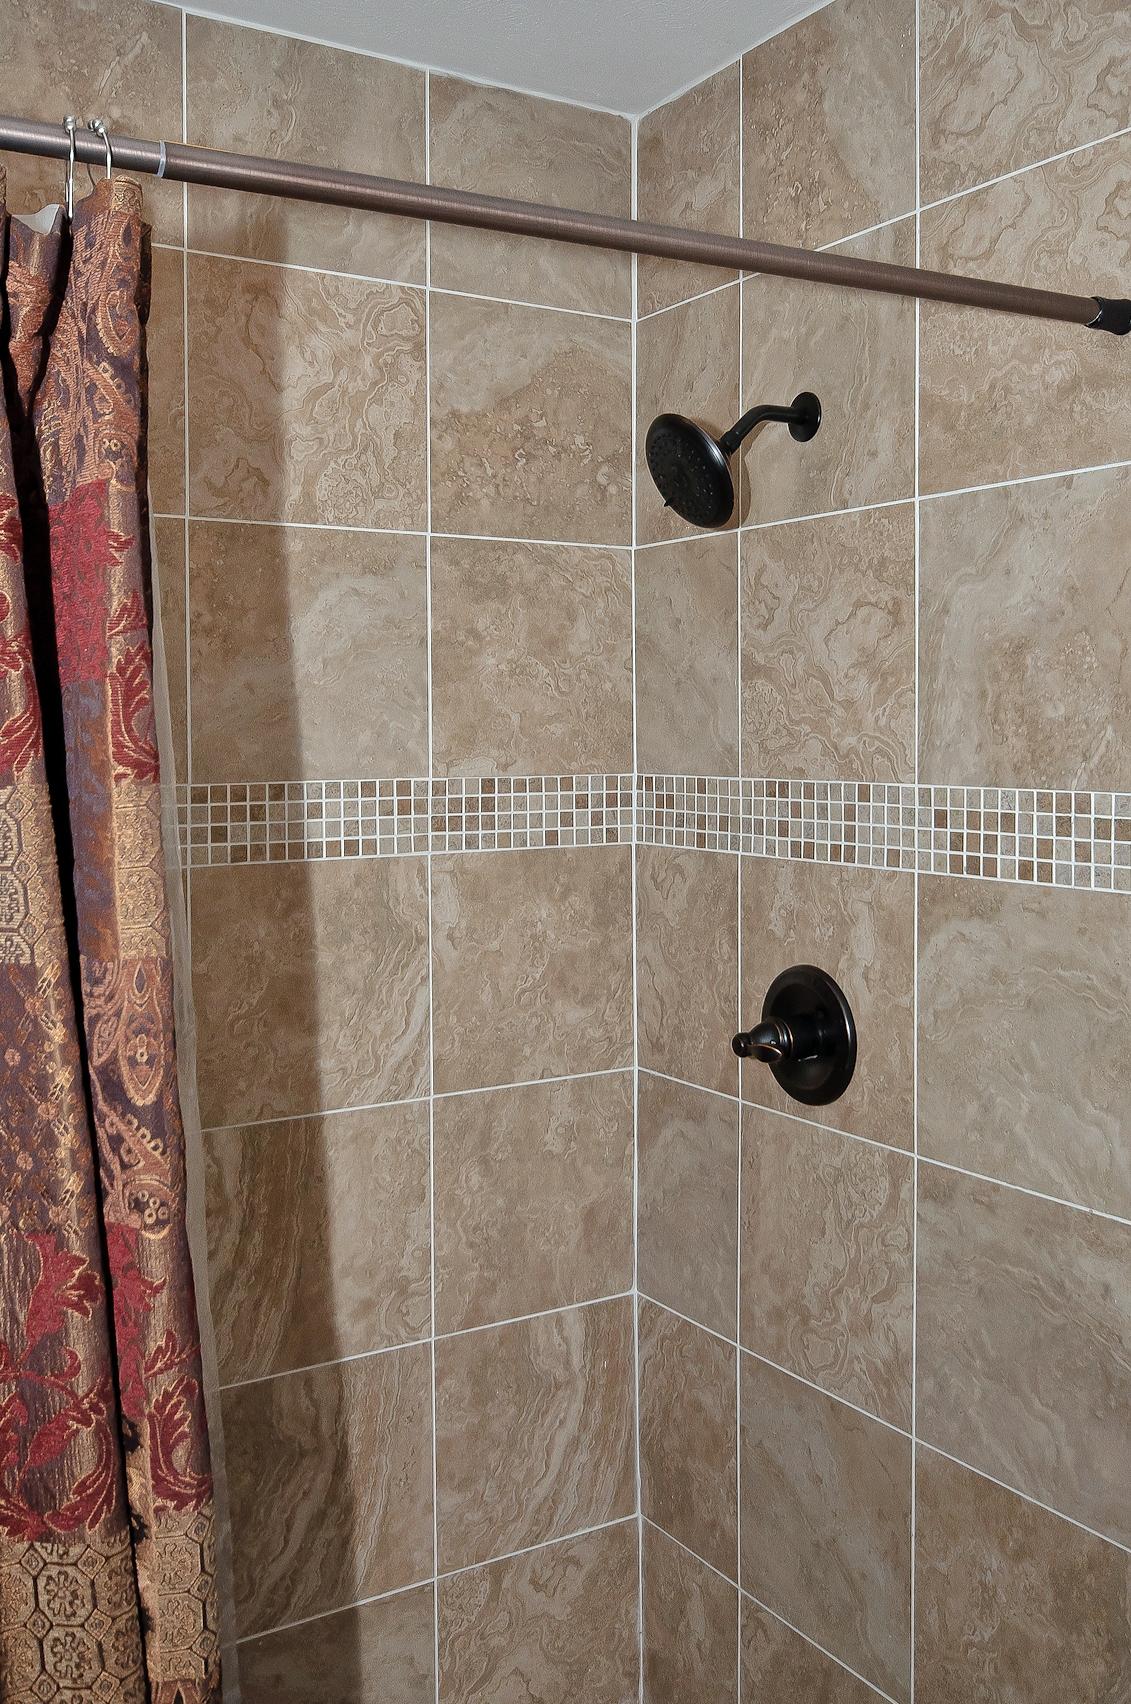 10414 Carry Back Cir Master Bath Shower.jpg